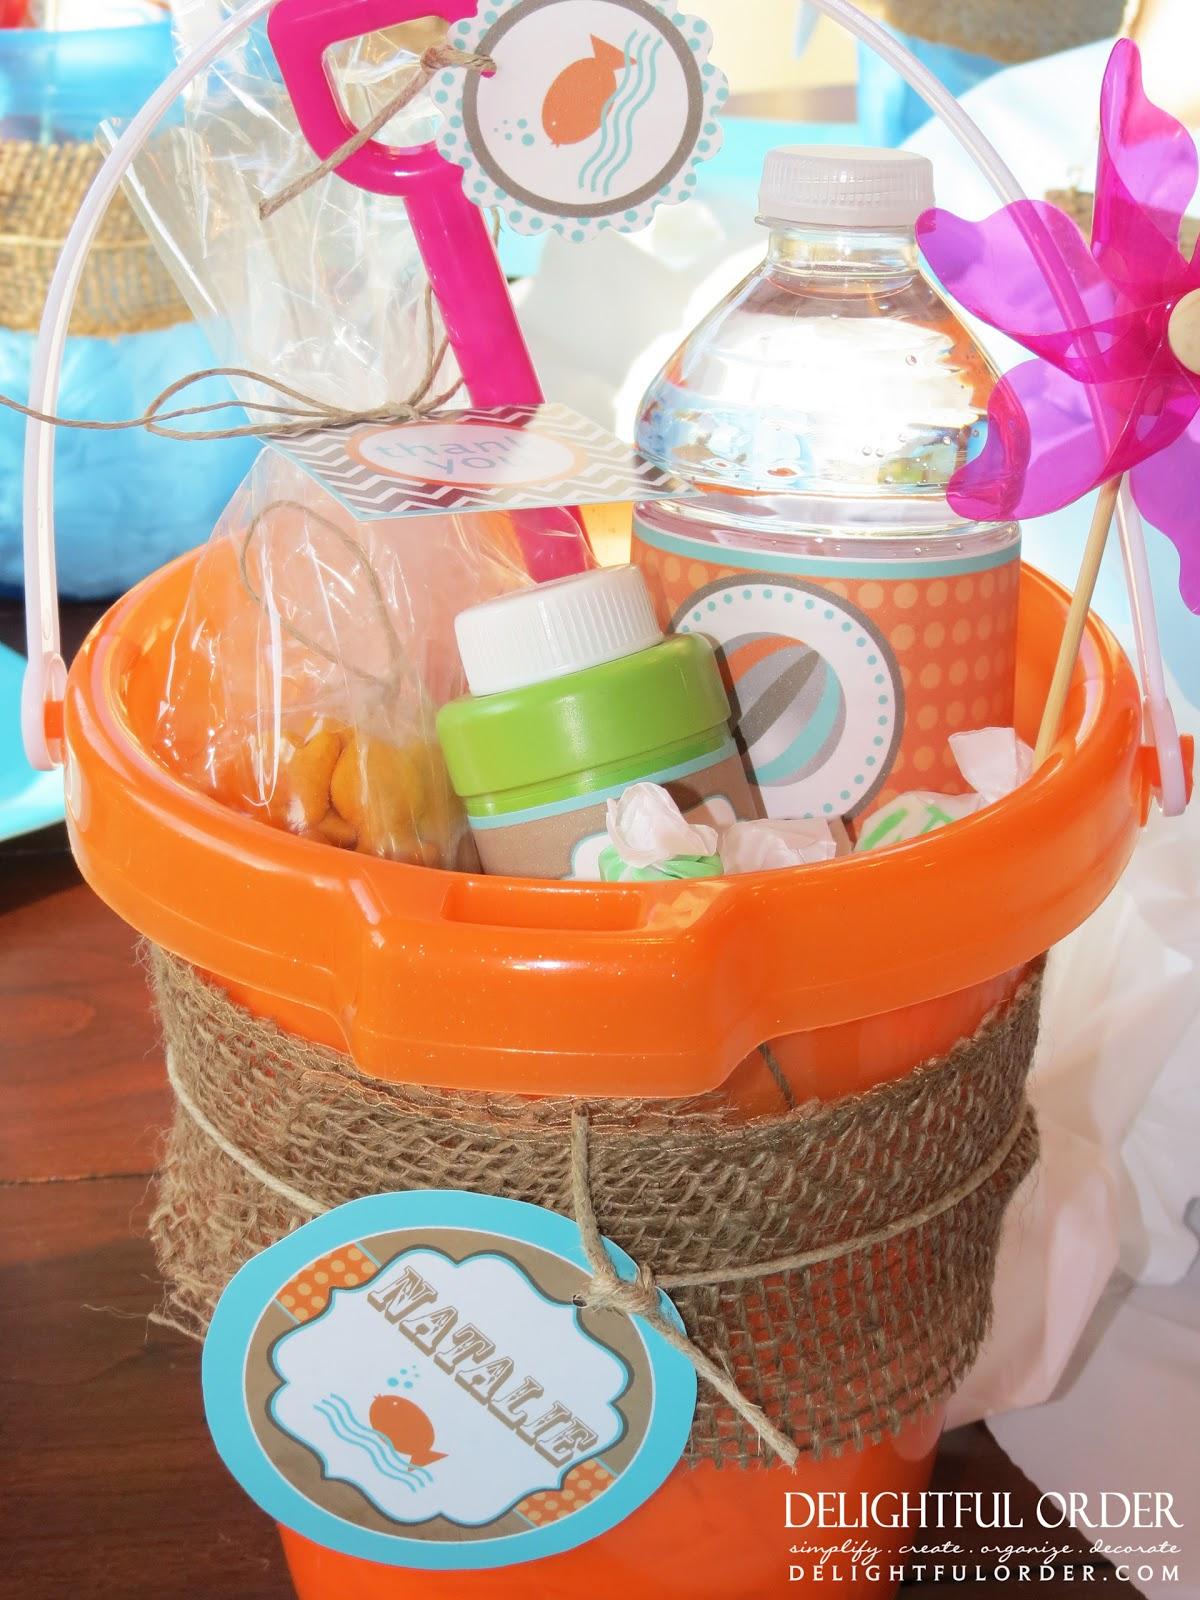 Delightful Order Splish Splash Birthday Party Ideas